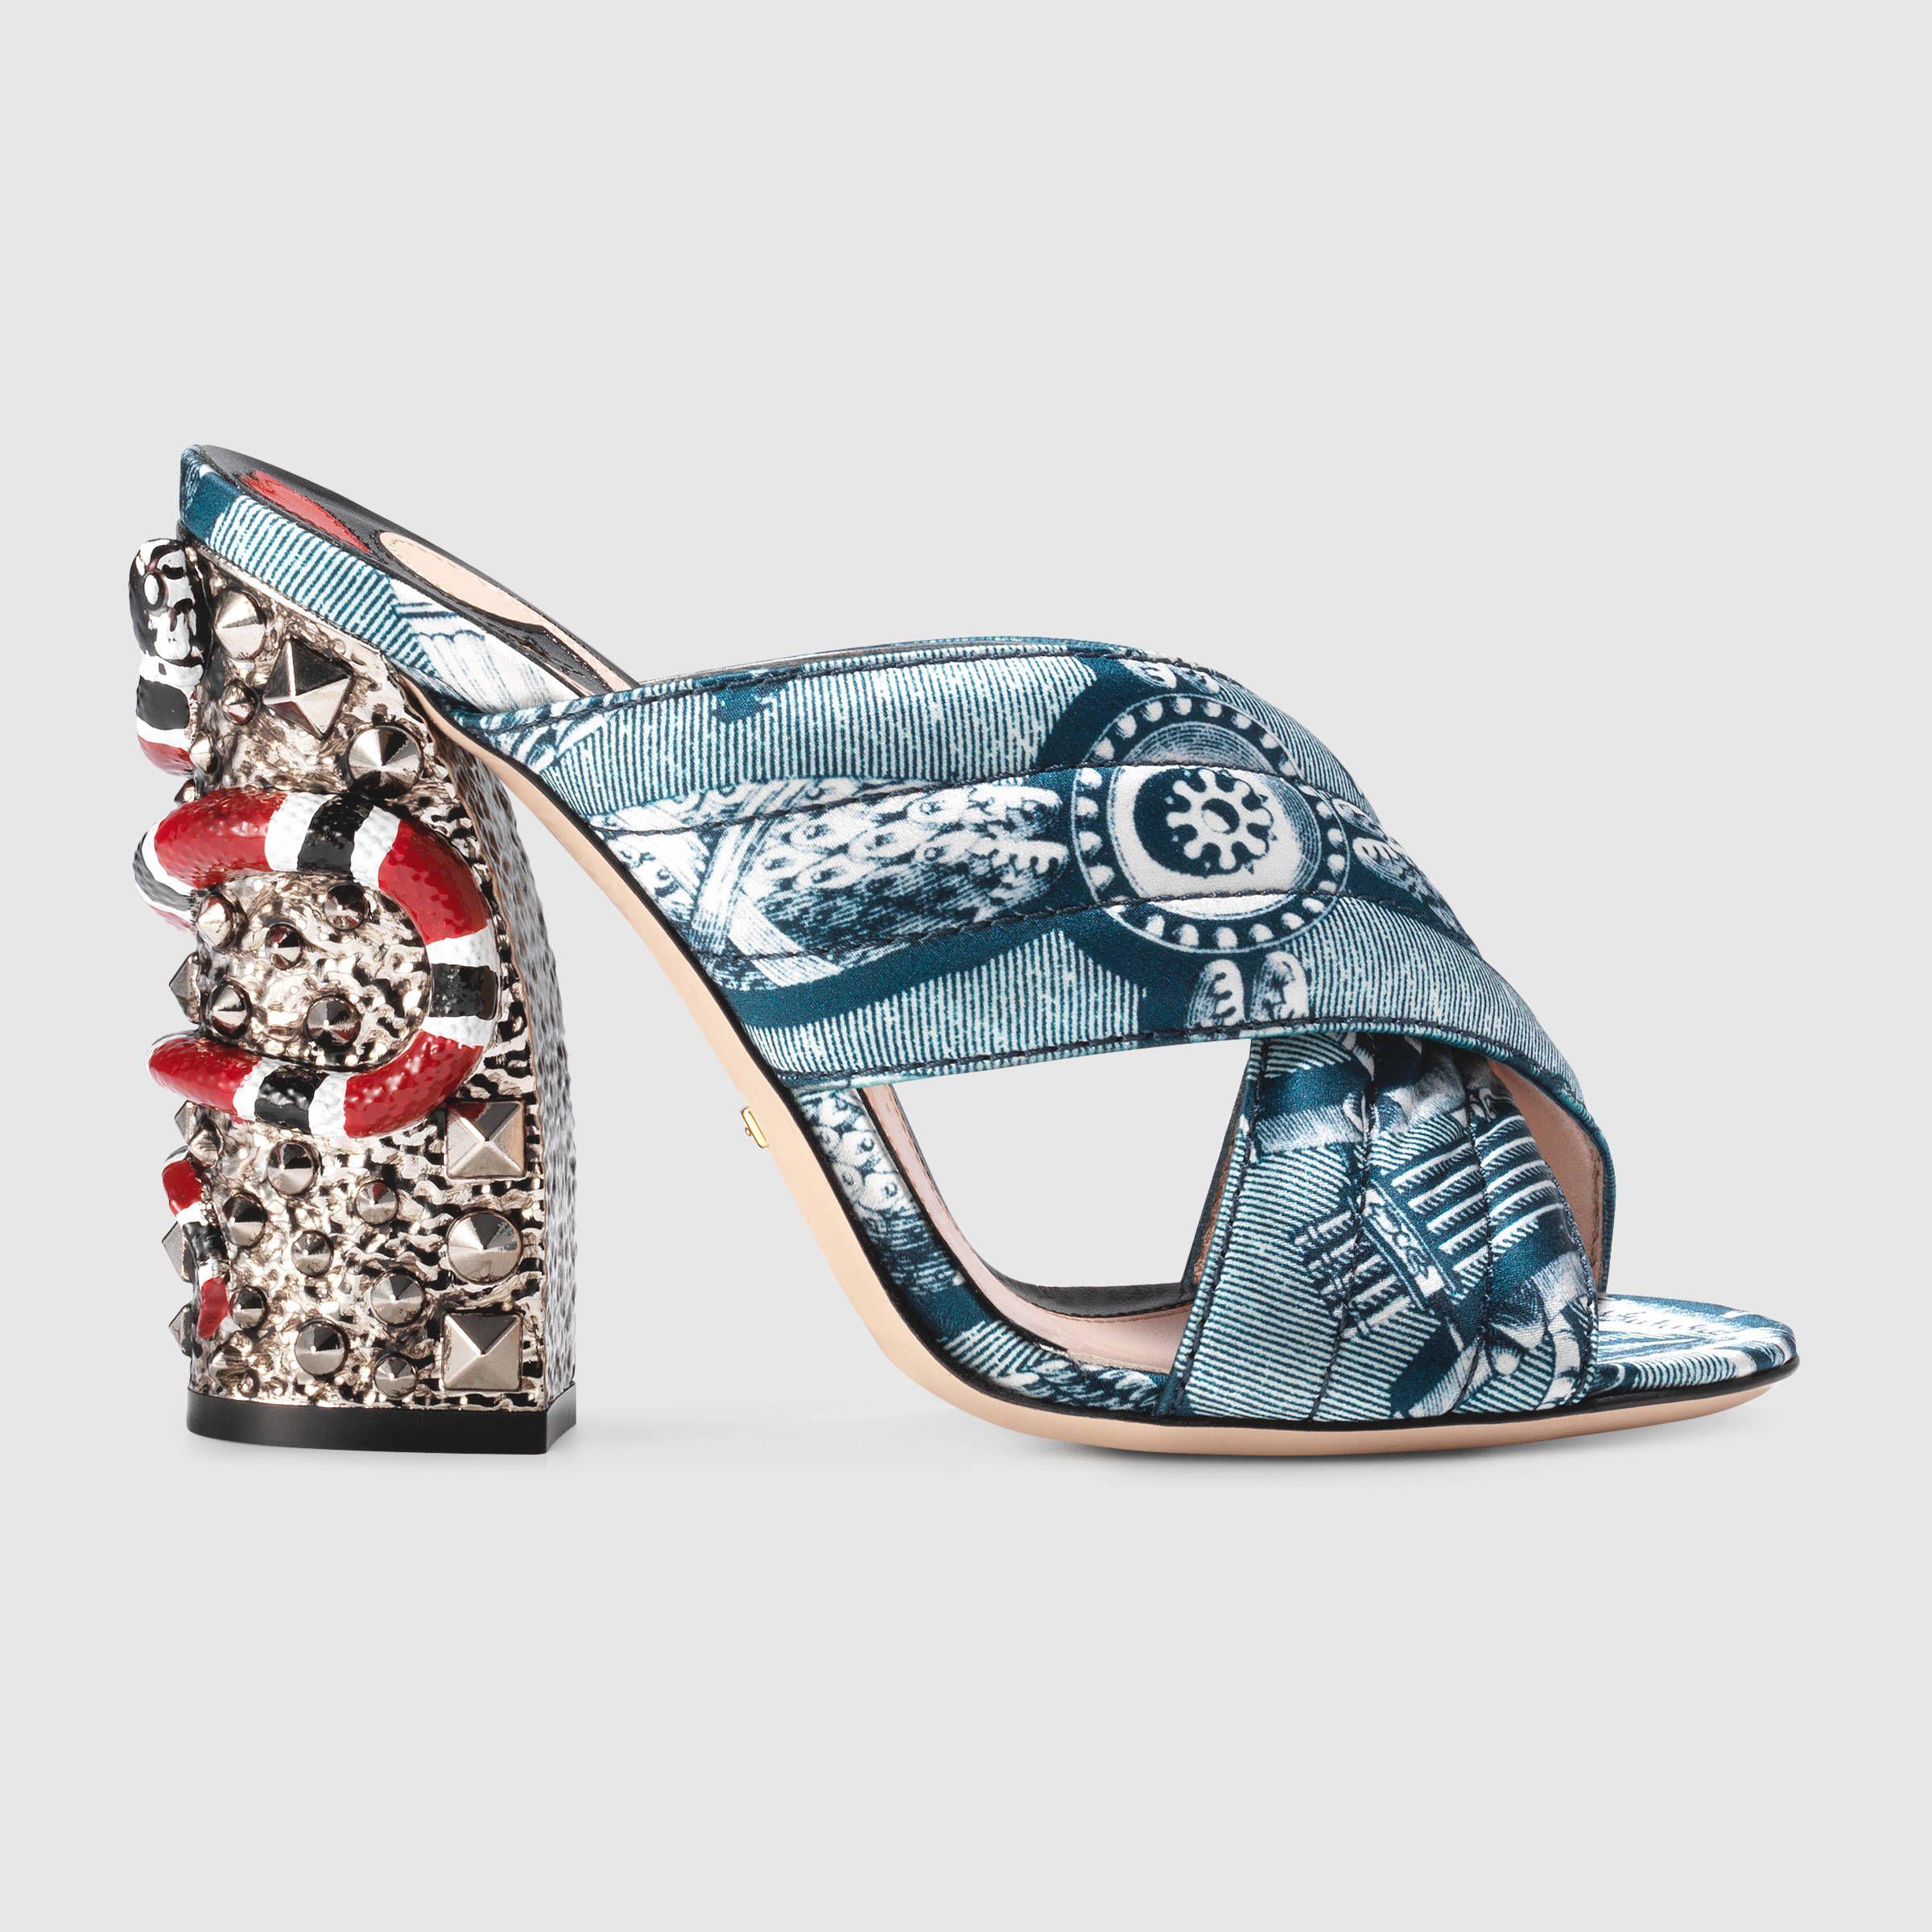 5270a886364c Gucci Women - Romain satin crossover sandal - 422050K0I004143 ...